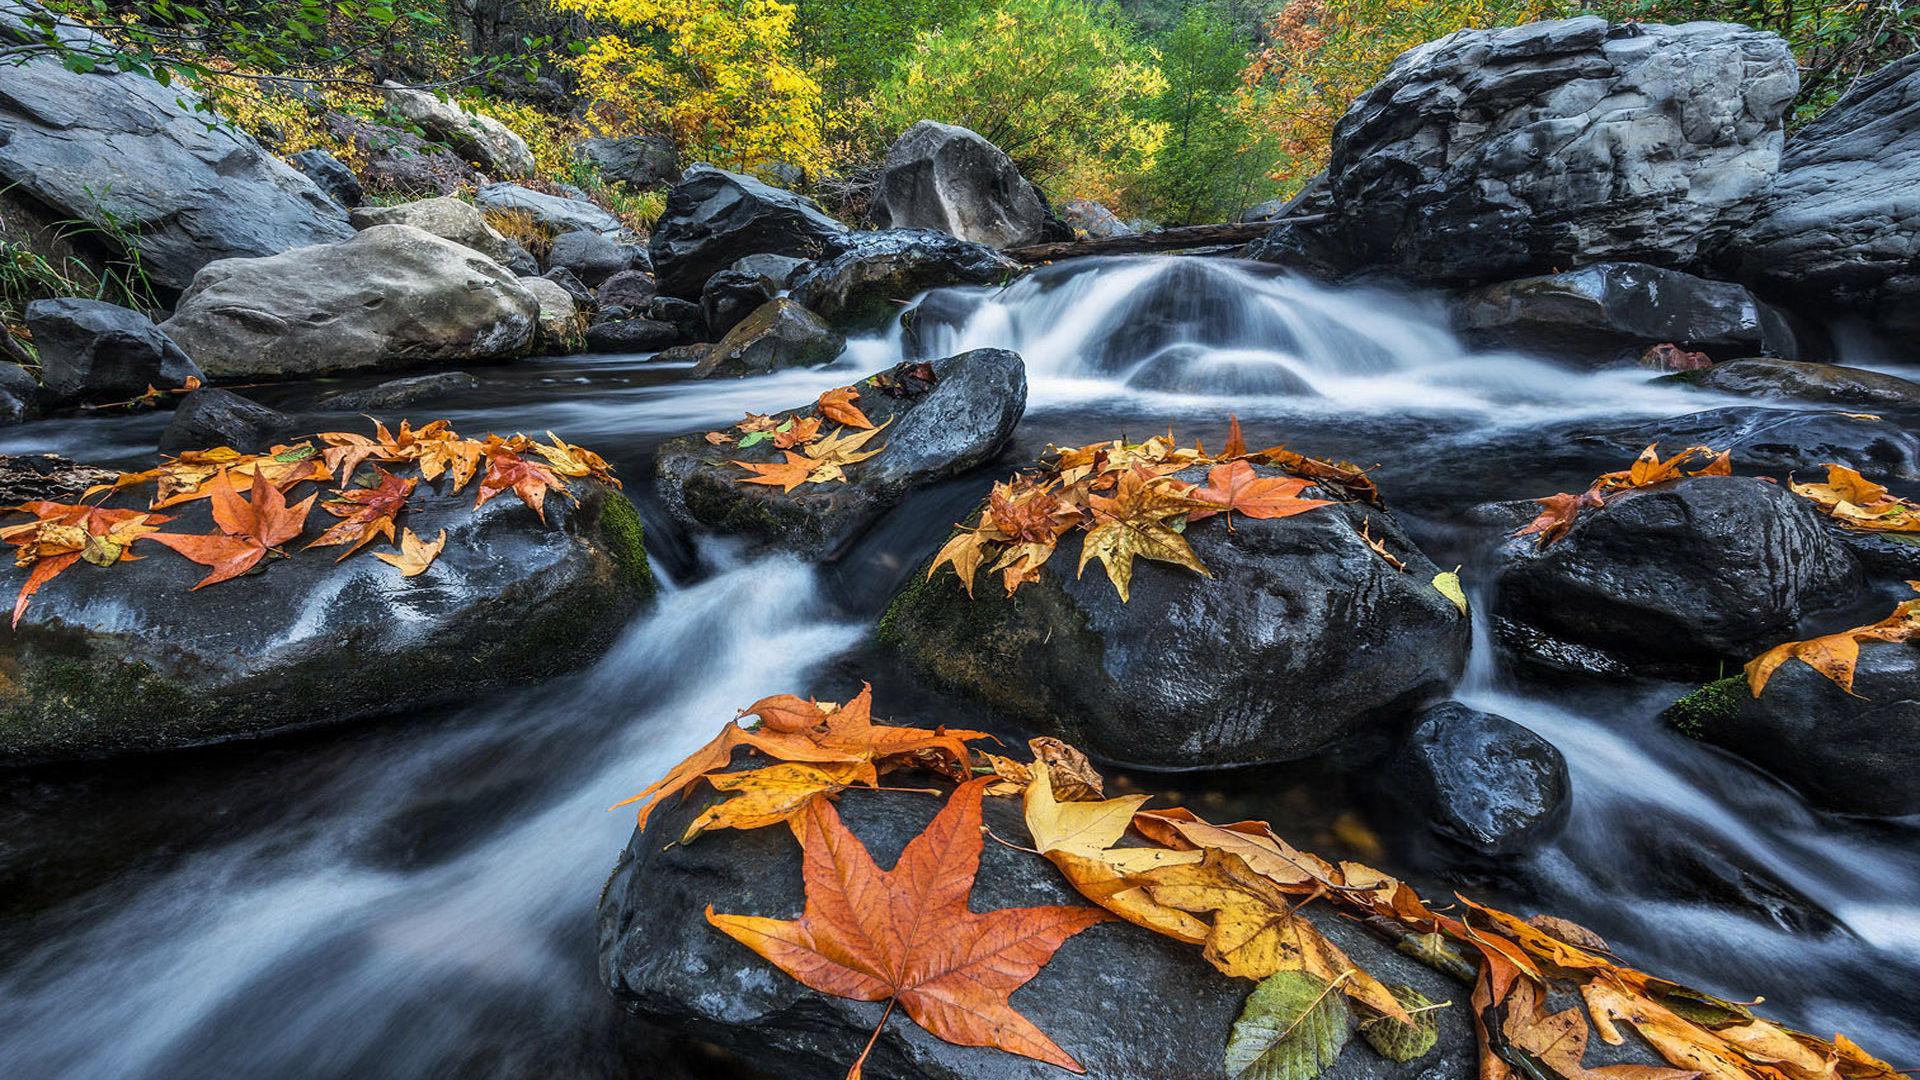 Fall Wallpaper Hd 1280x1024 River And Gorge Oak Creek Canyon In Northern Arizona